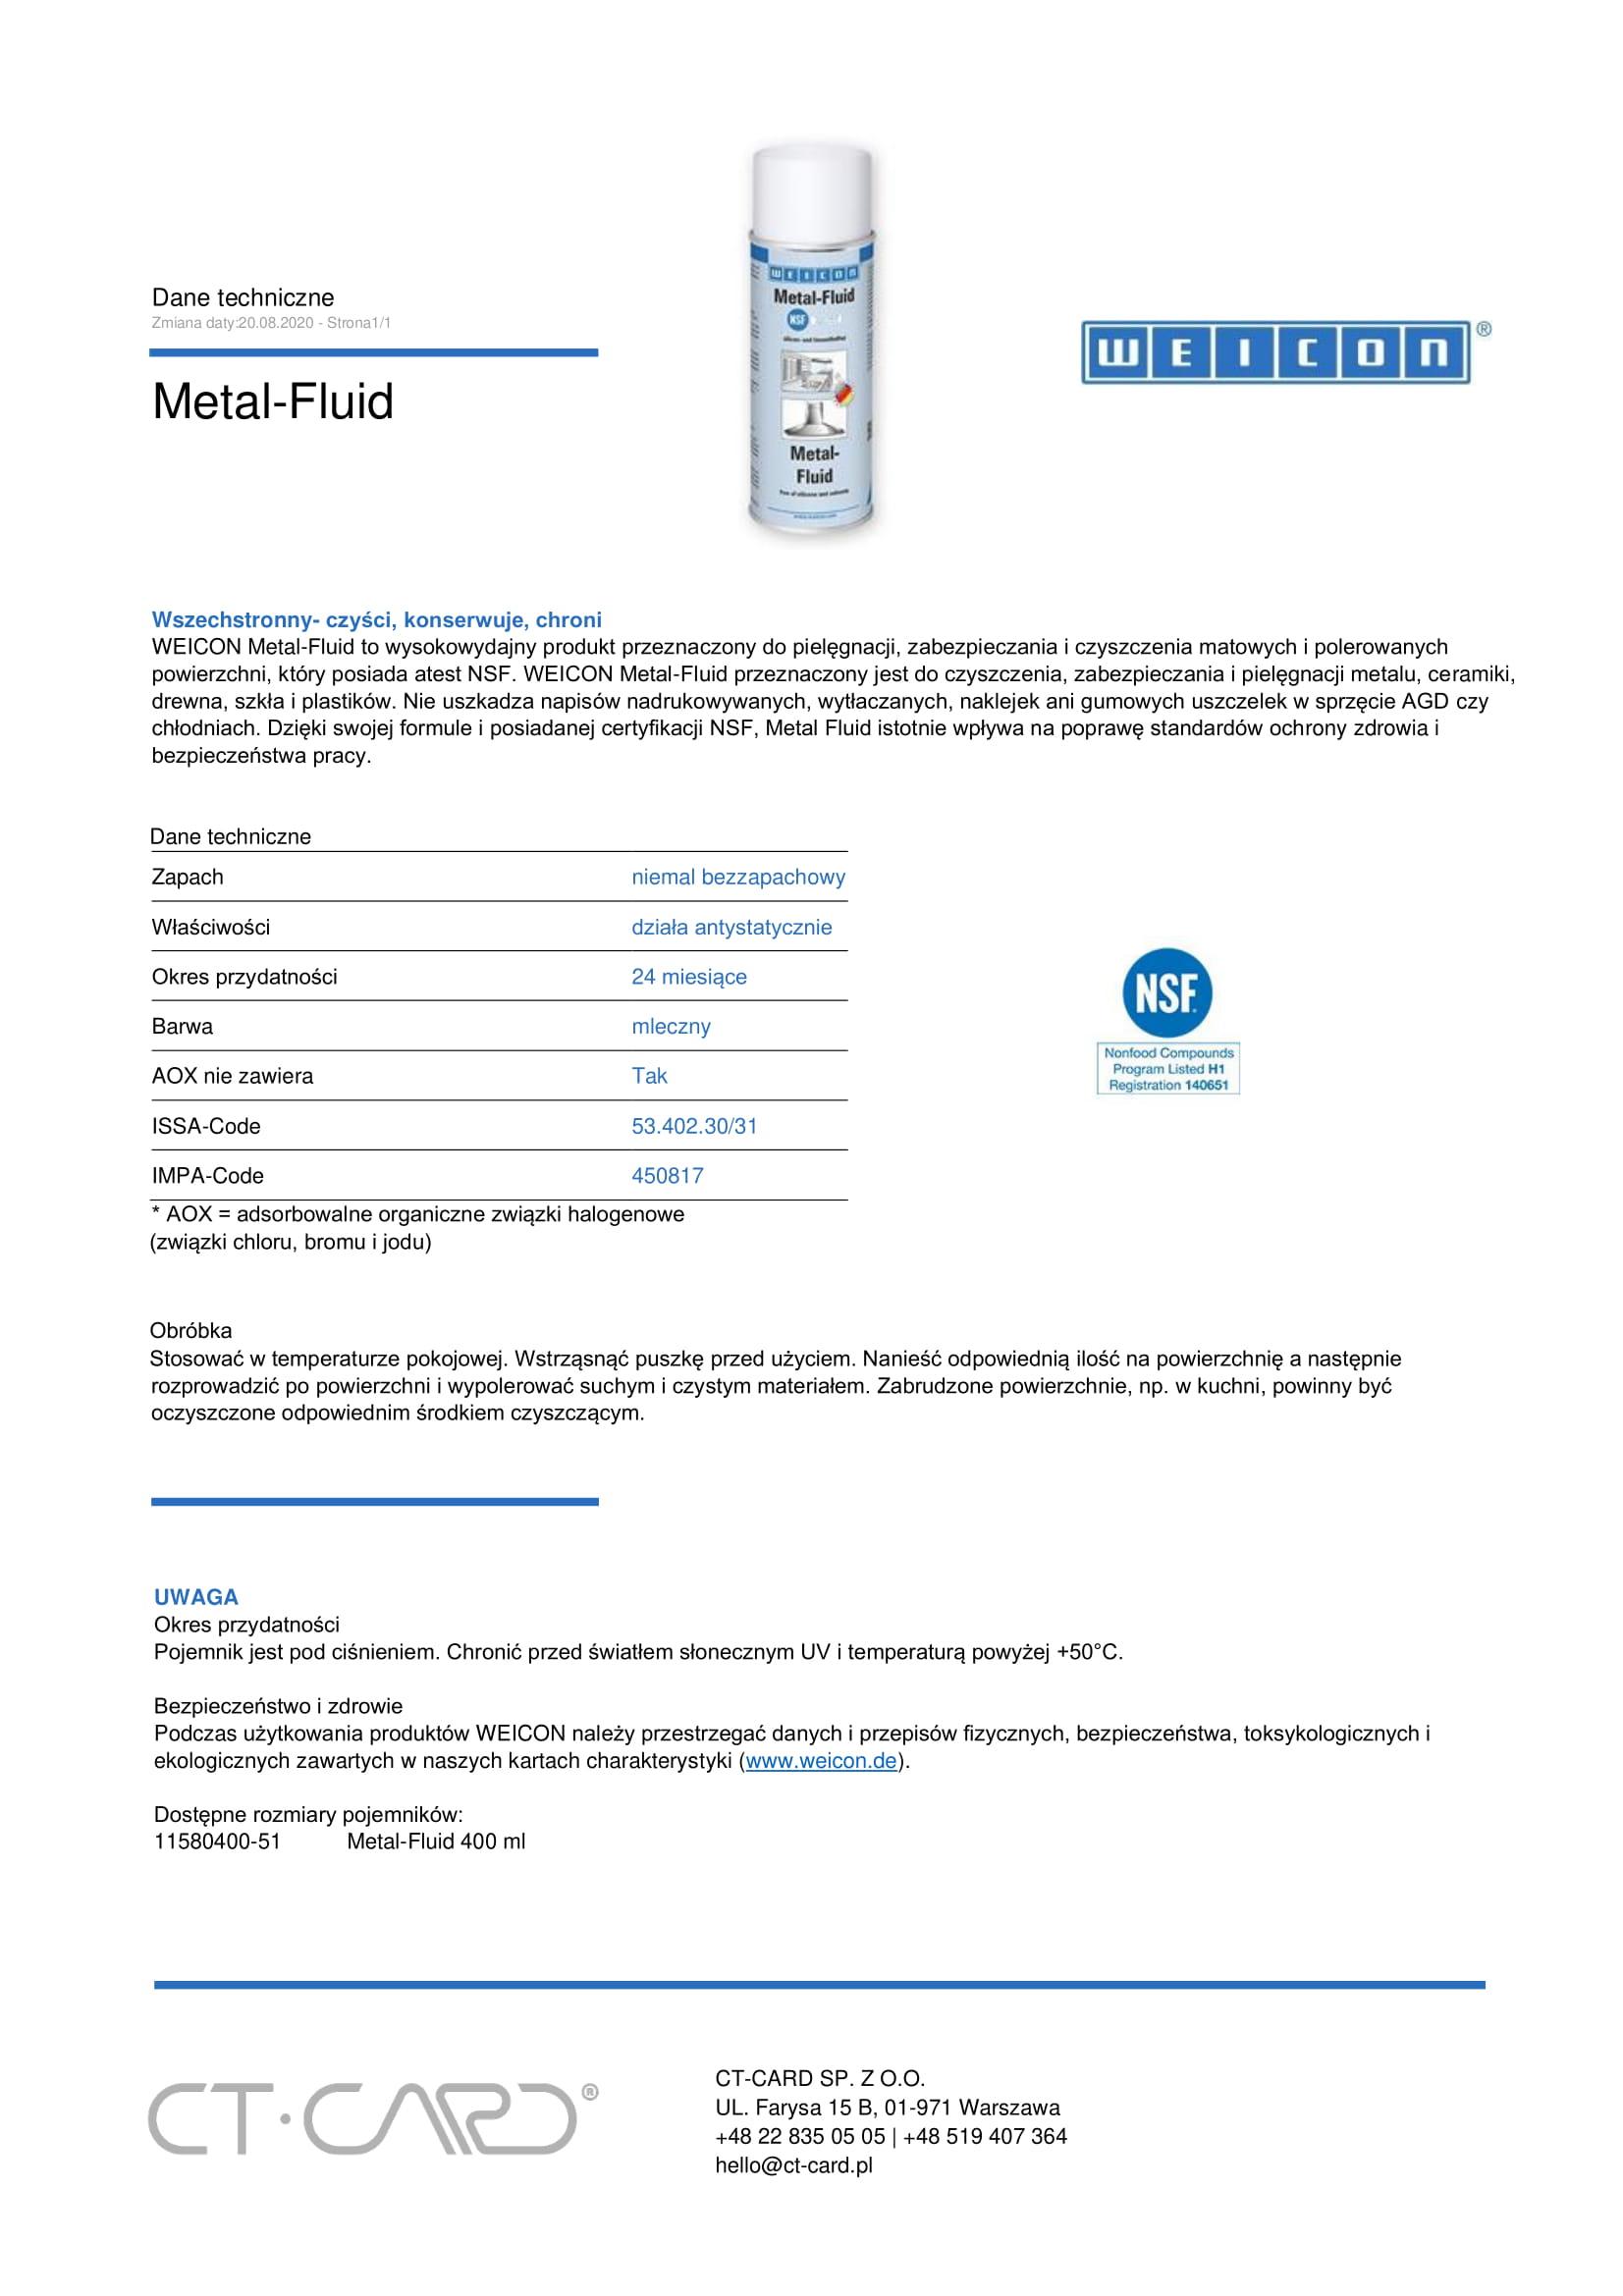 Metal-Fluid-1